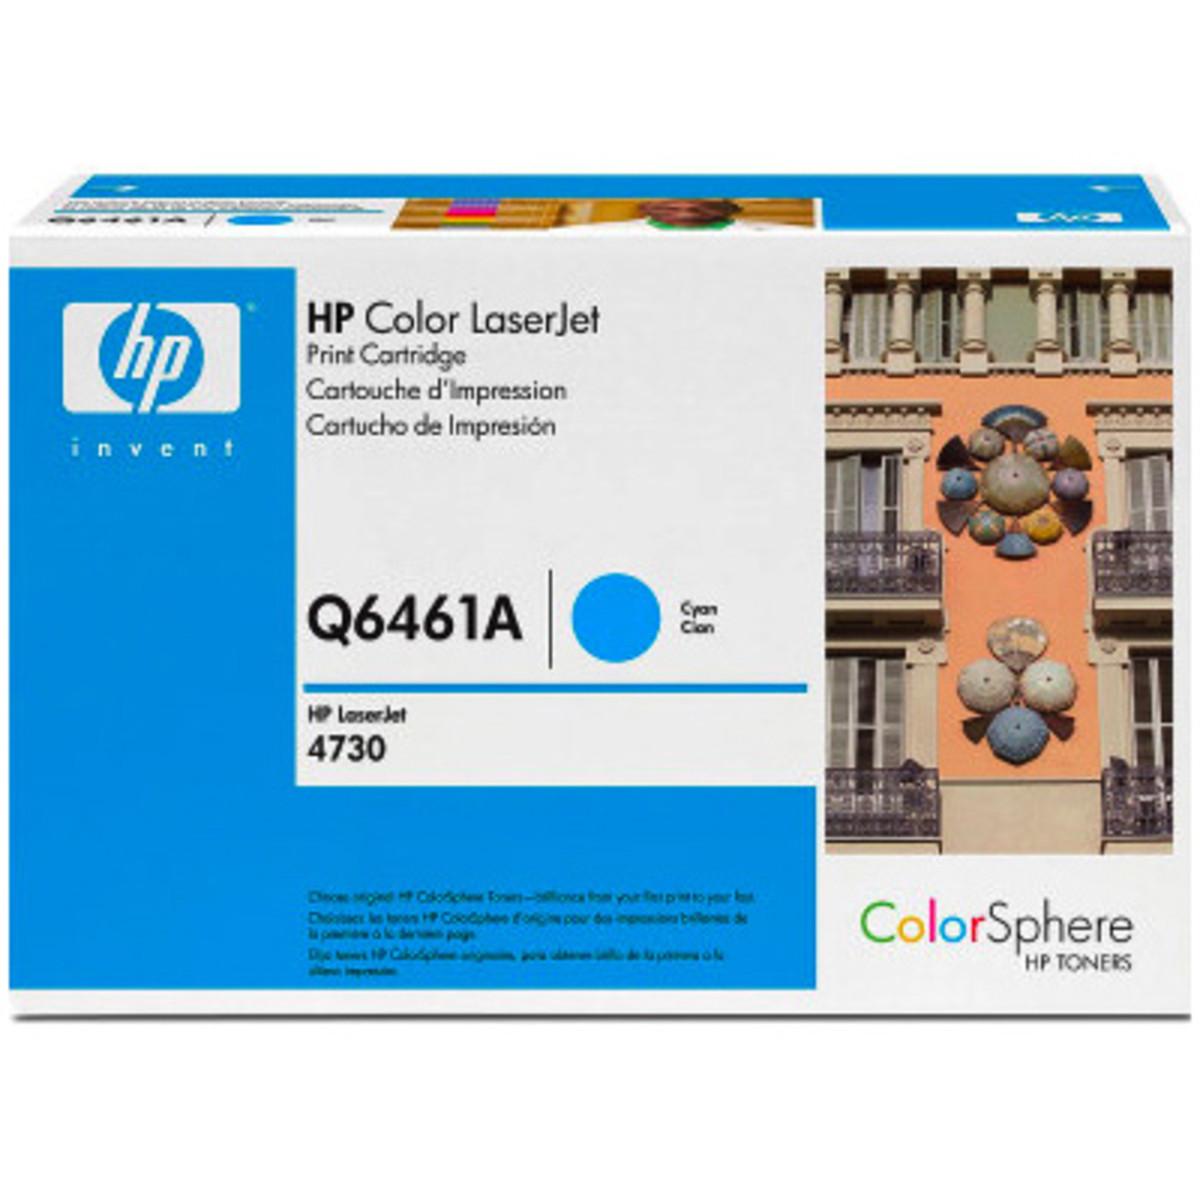 HP 644A (Q6461A) Cyan Toner Cartridge